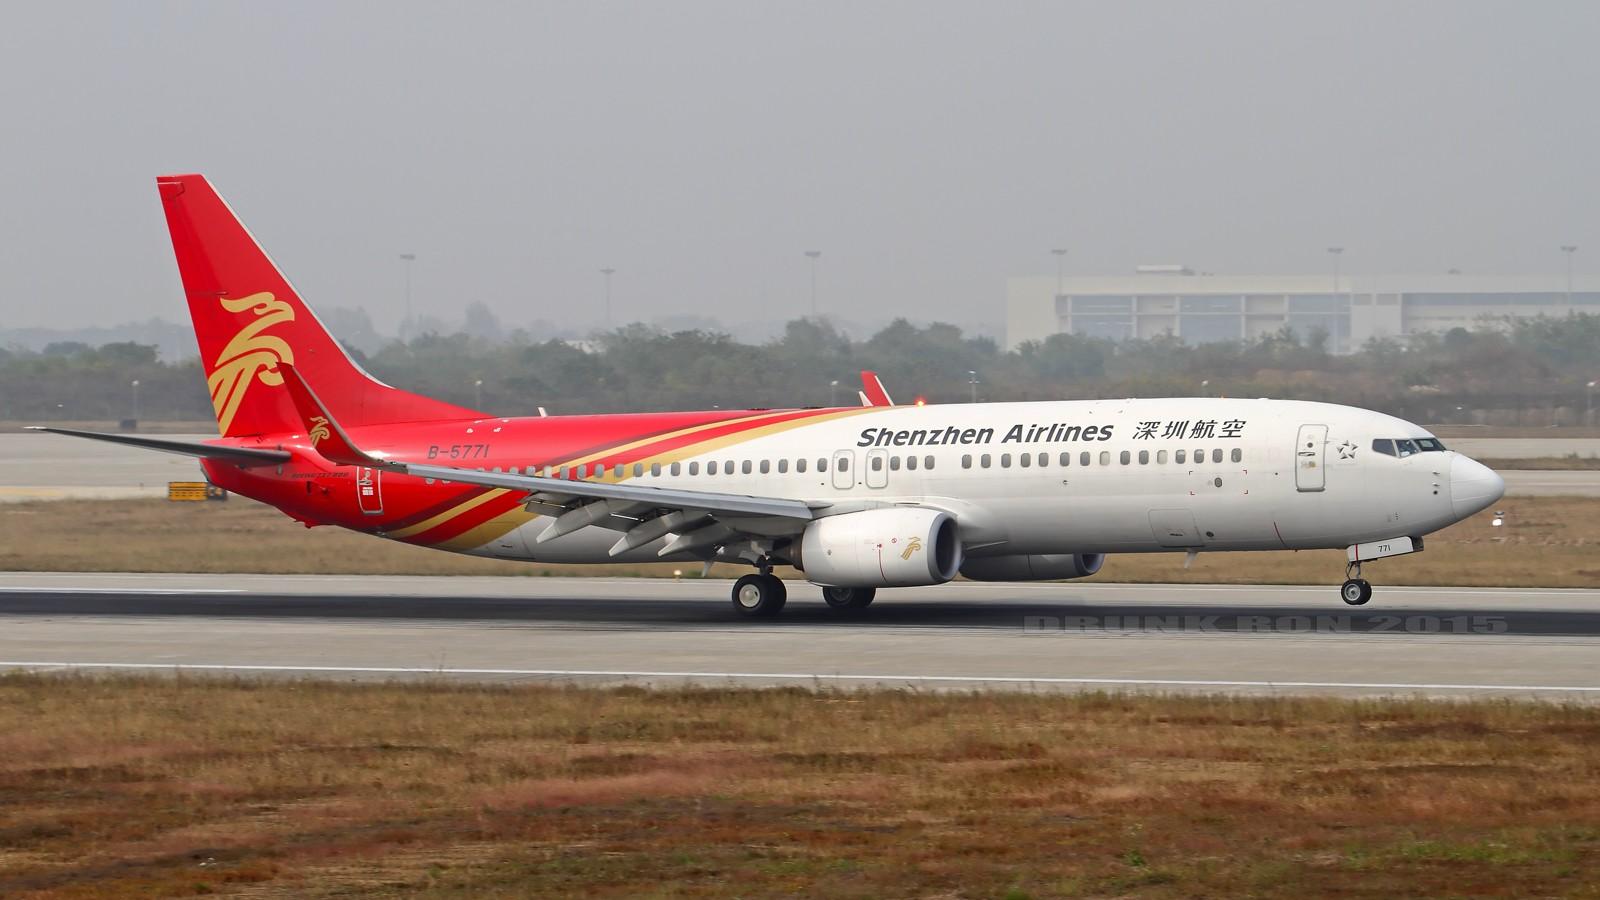 Re:[原创]NKG~十月份的作业(一) BOEING 737-800 B-5771 中国南京禄口国际机场